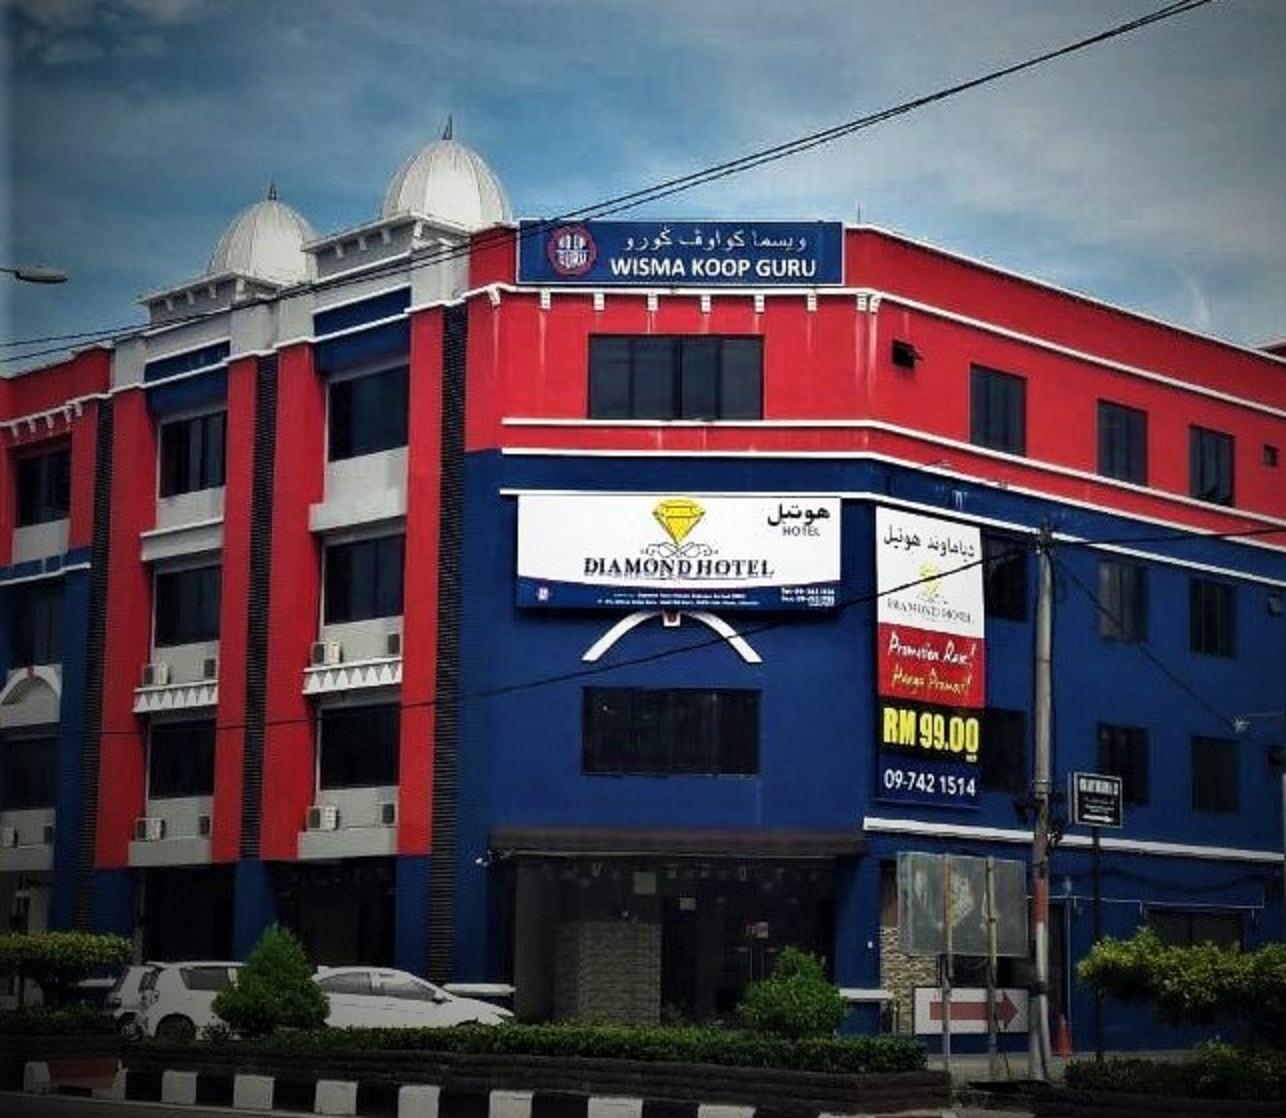 OYO 1151 Diamond Hotel, Kota Bharu